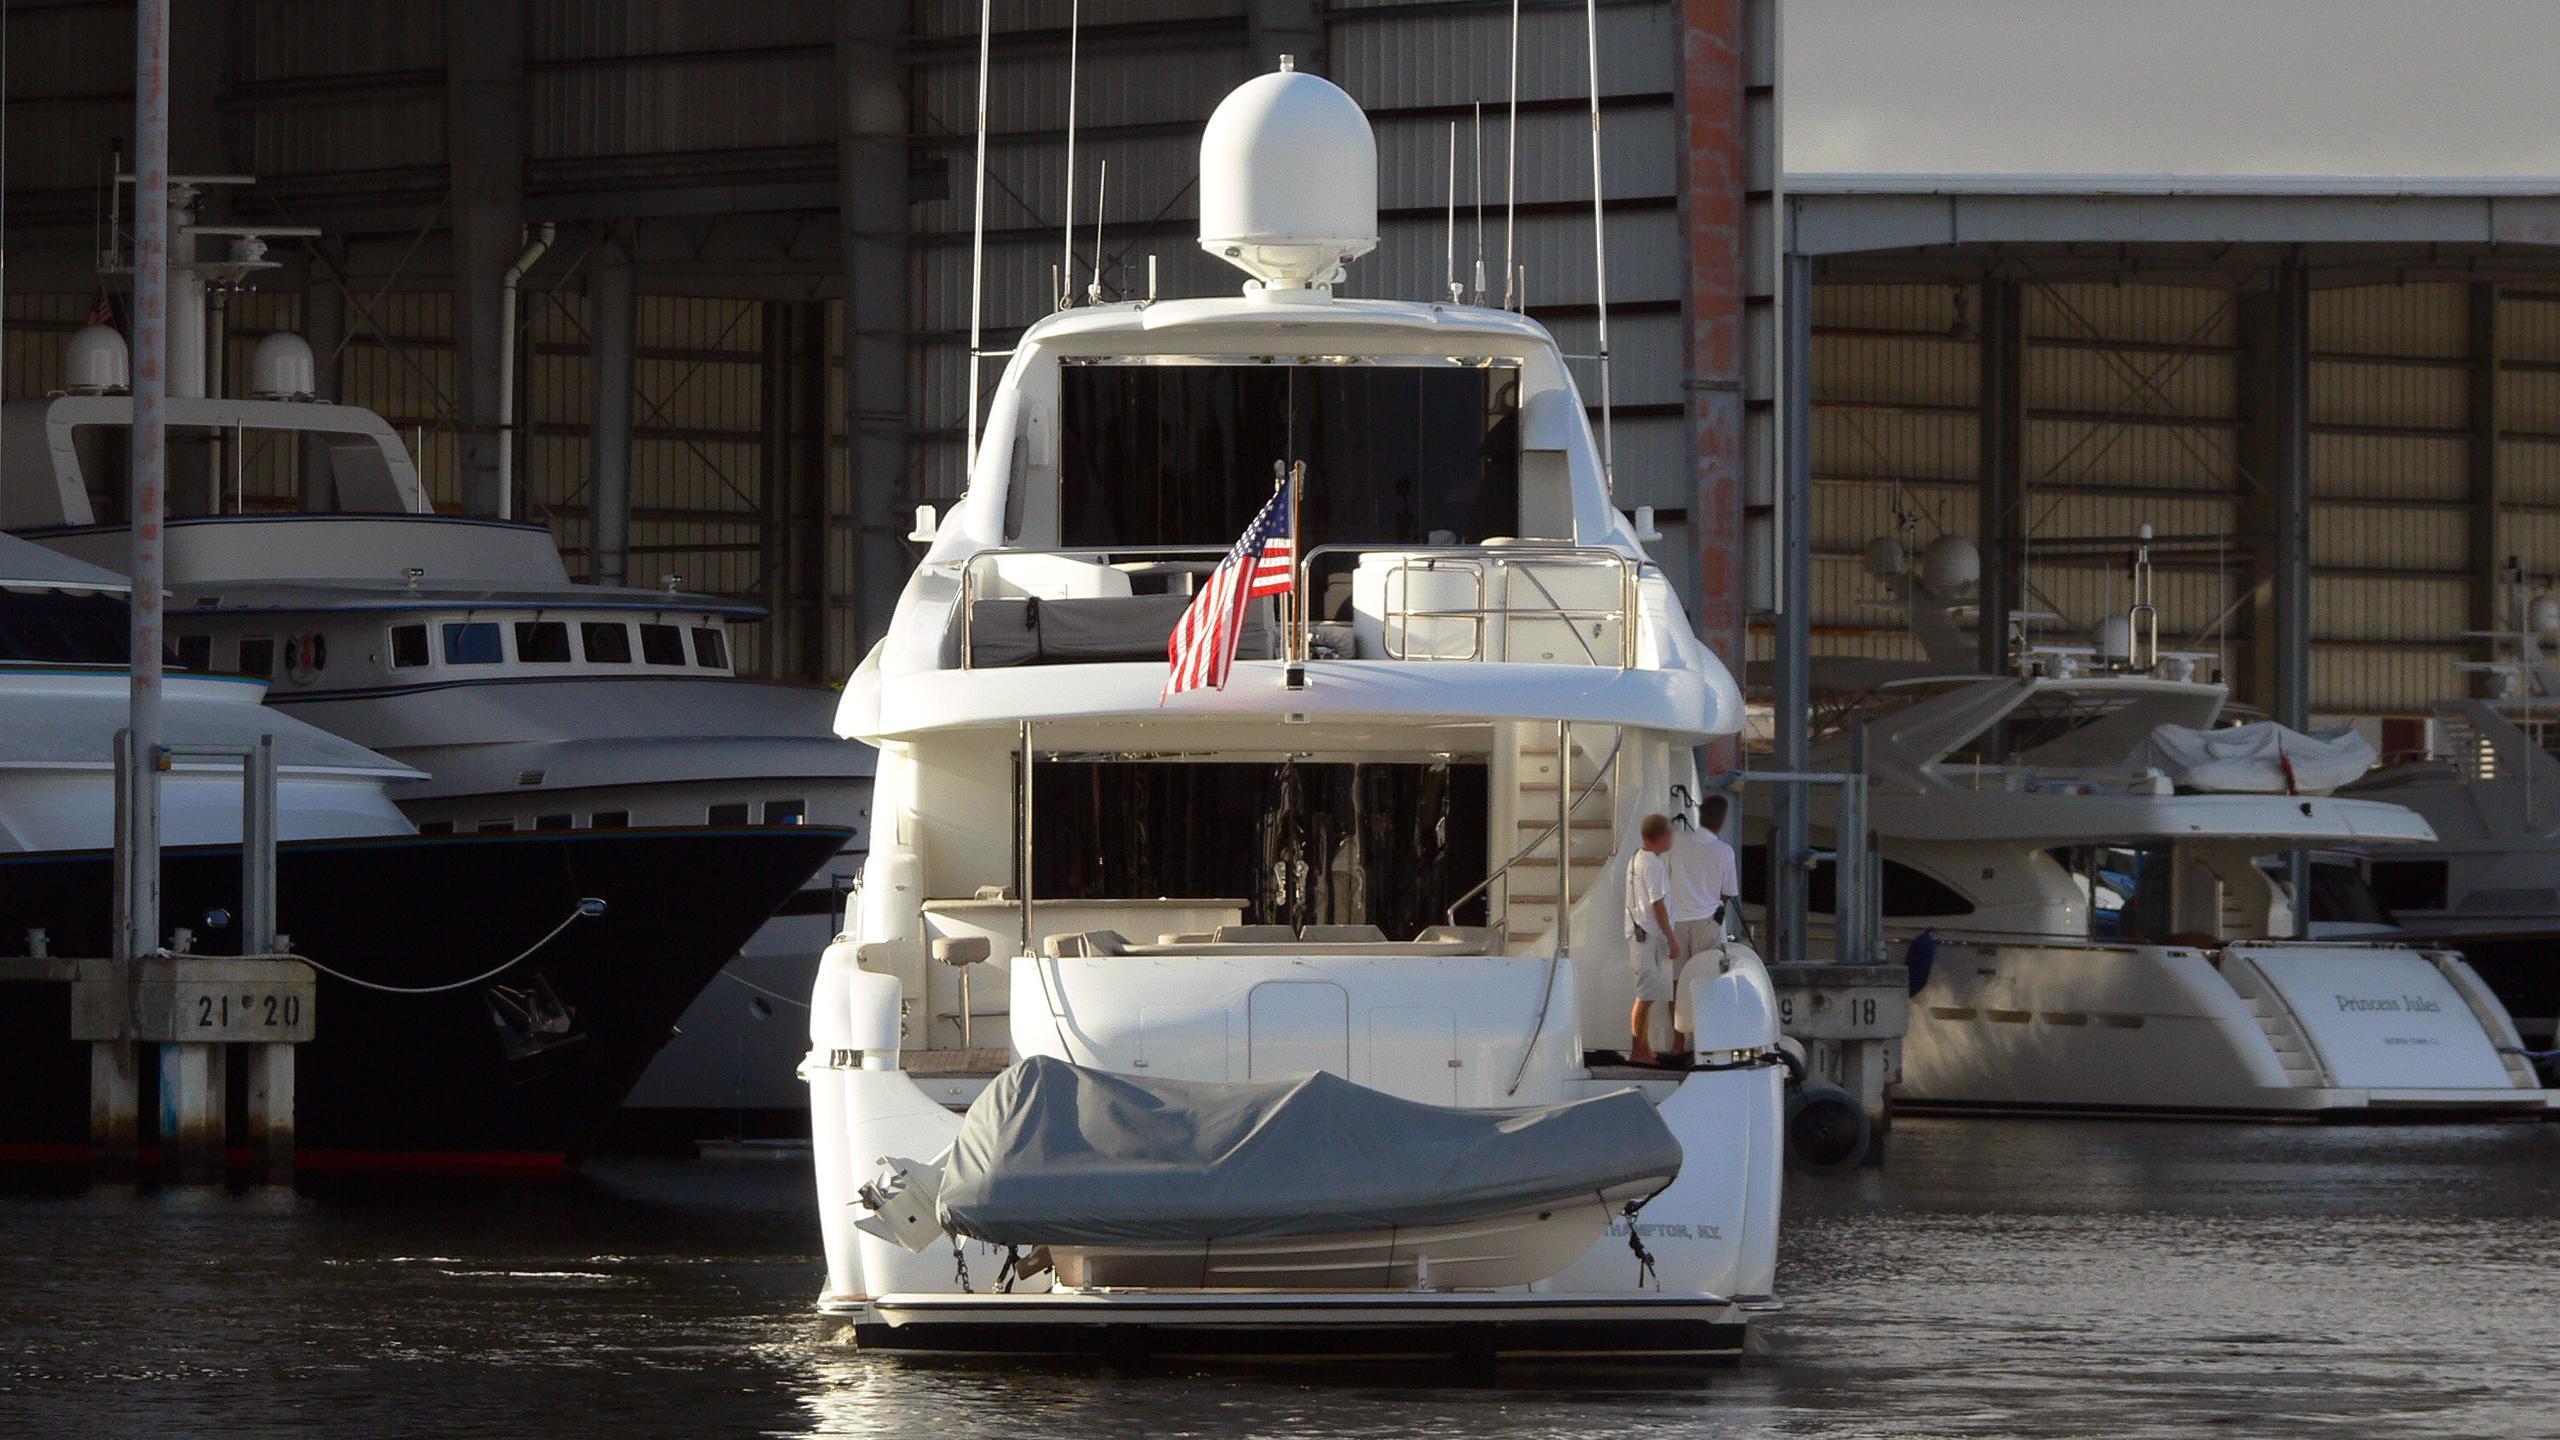 the-beeliever-halftime-motor-yacht-lazzara-2005-33m-stern